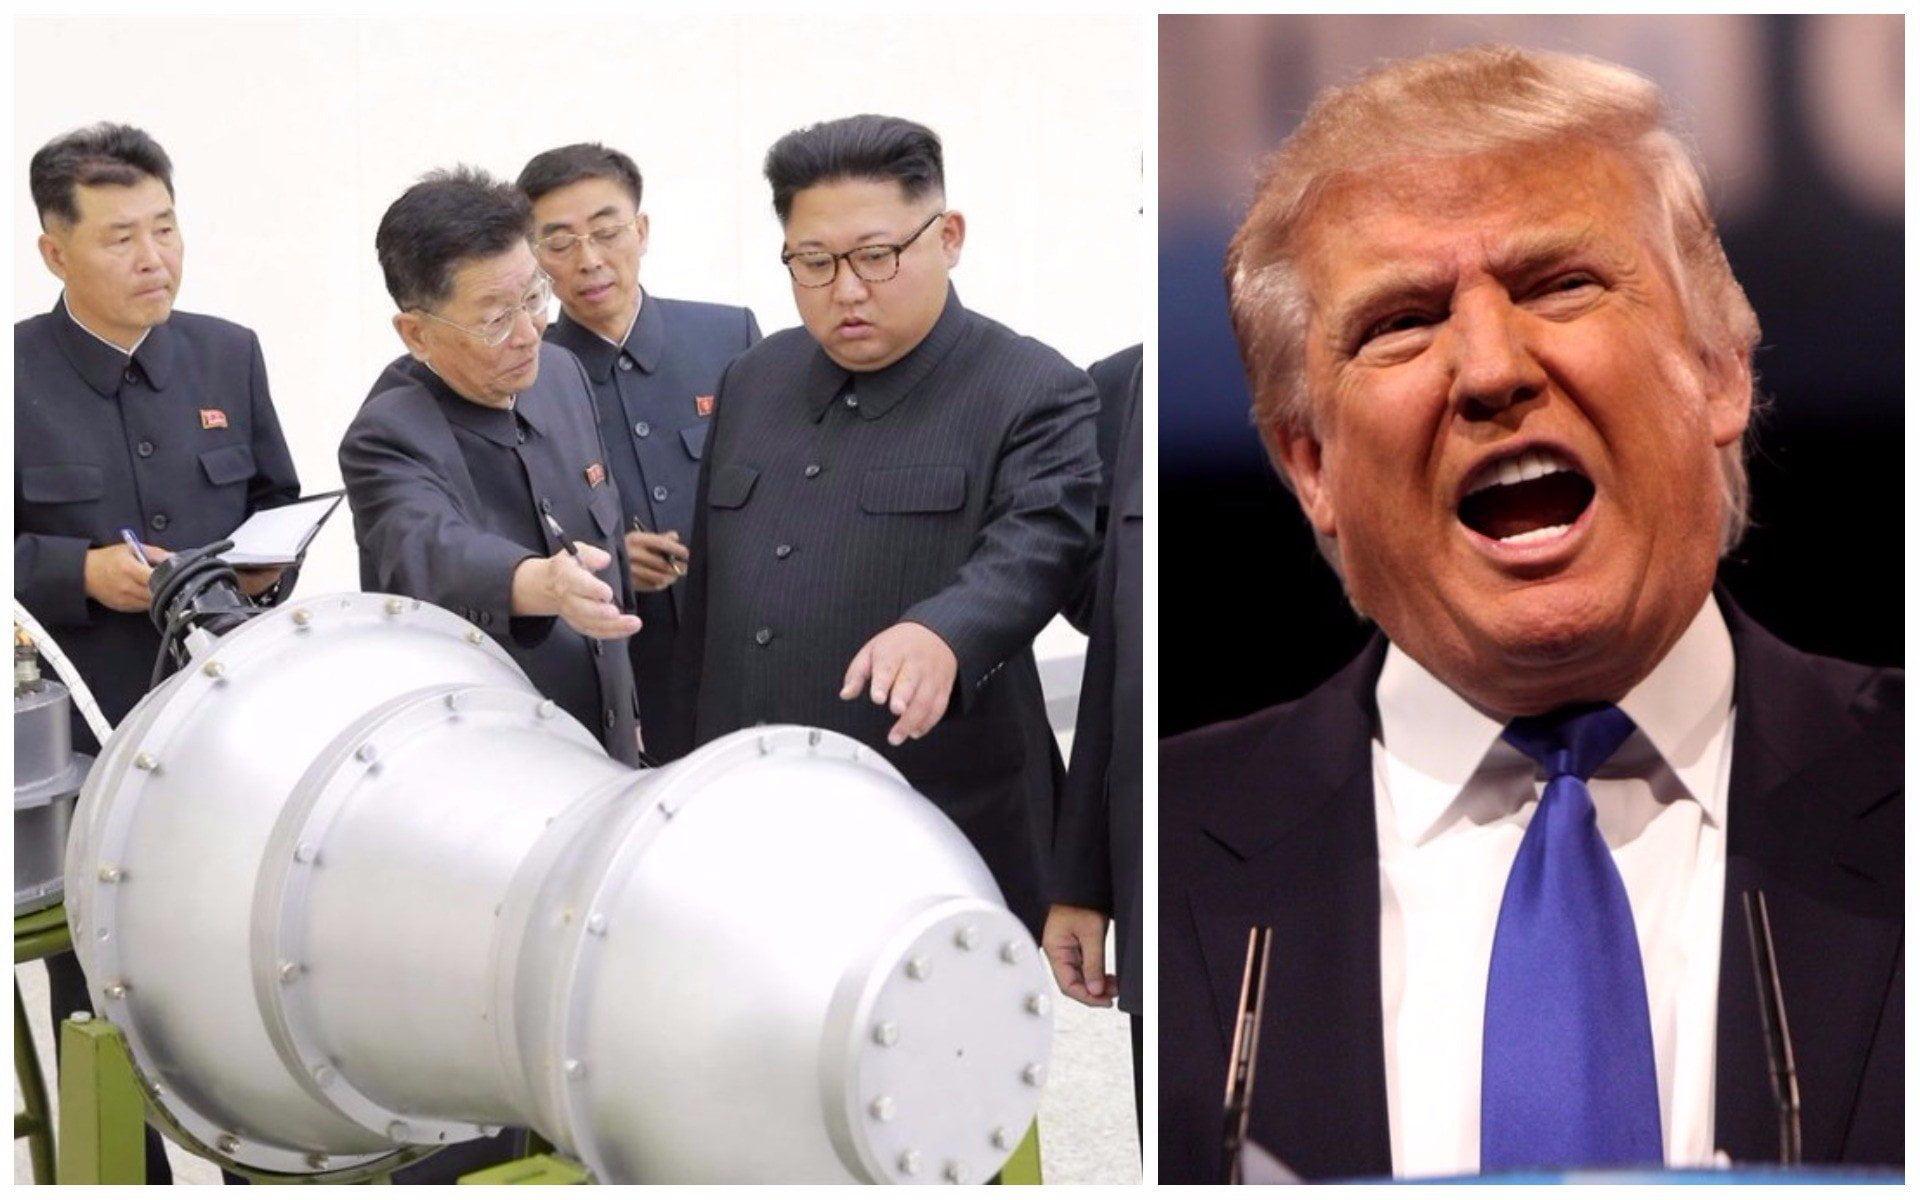 Bomba de Corea del Norte desata ira de Trump